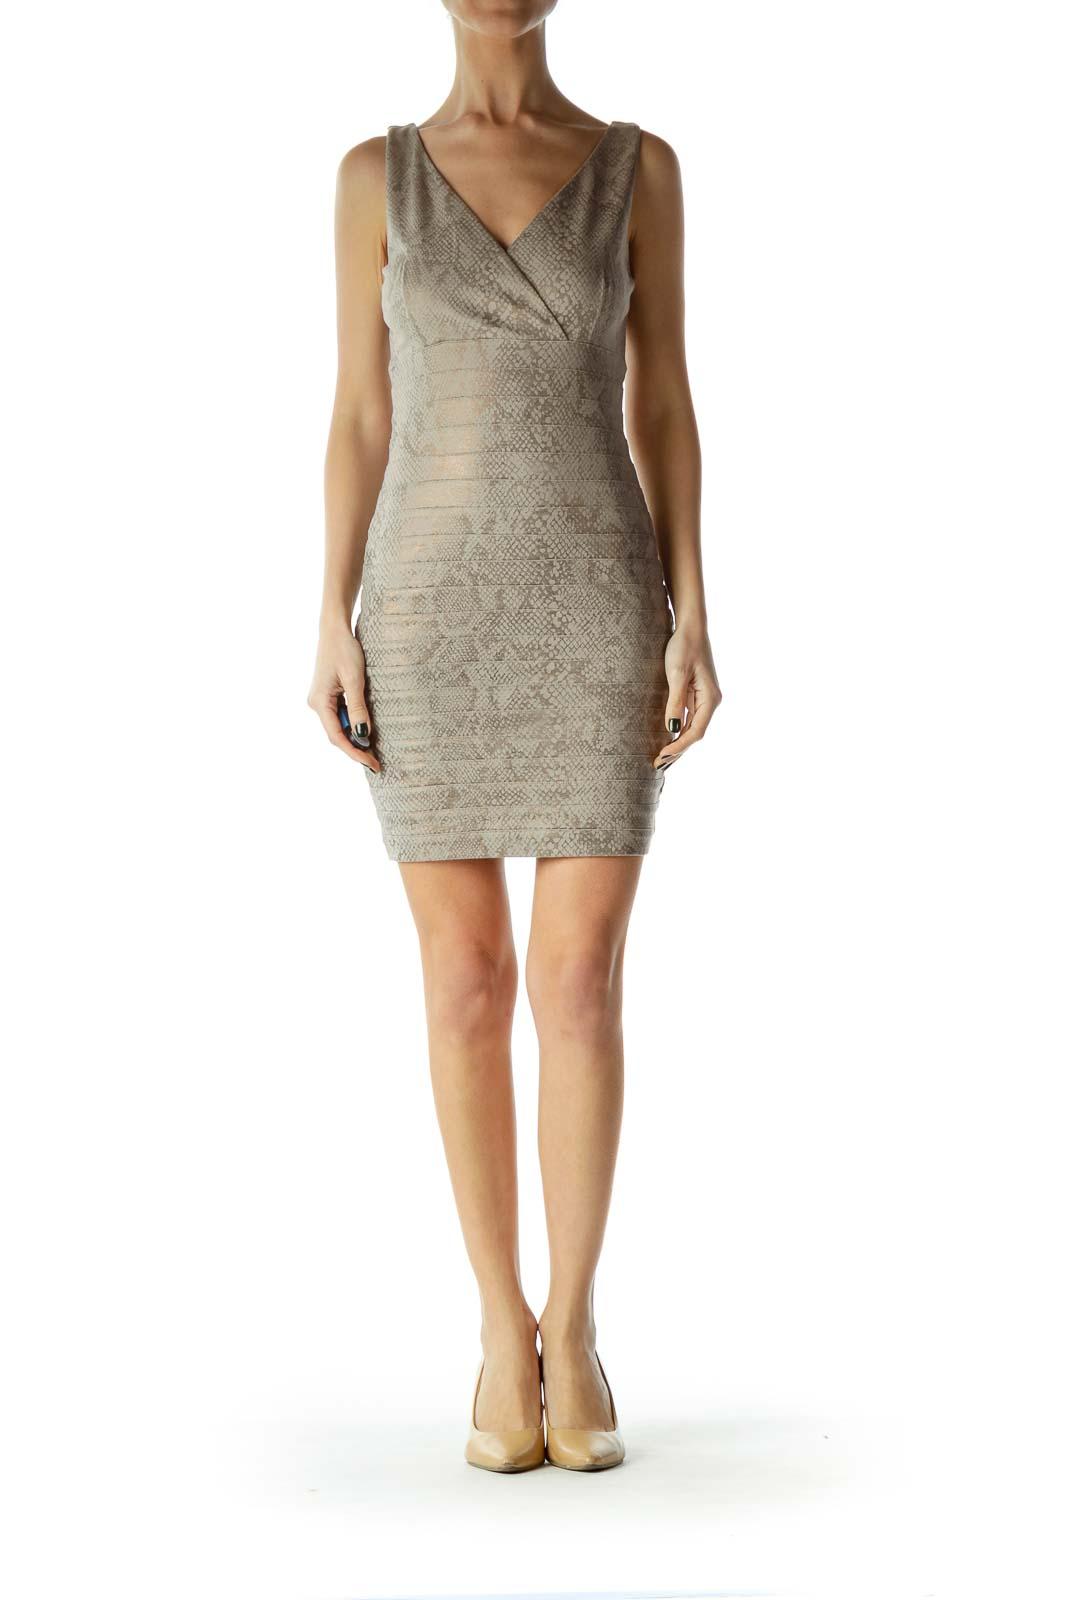 Brown Metallic Snakeskin Print Cocktail Dress